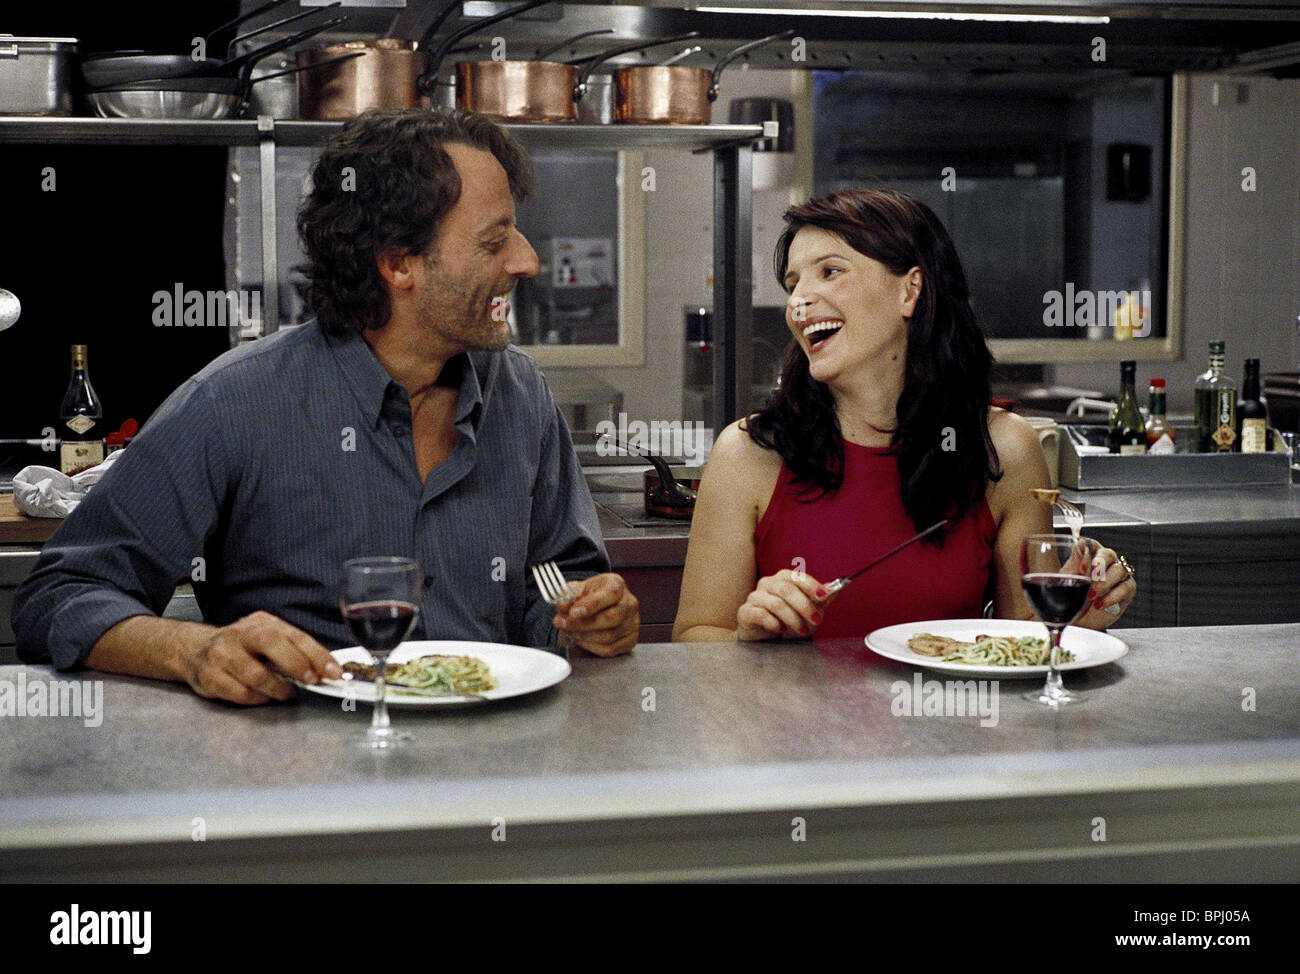 JEAN RENO & JULIETTE BINOCHE JET LAG (2002 Stock Photo ...